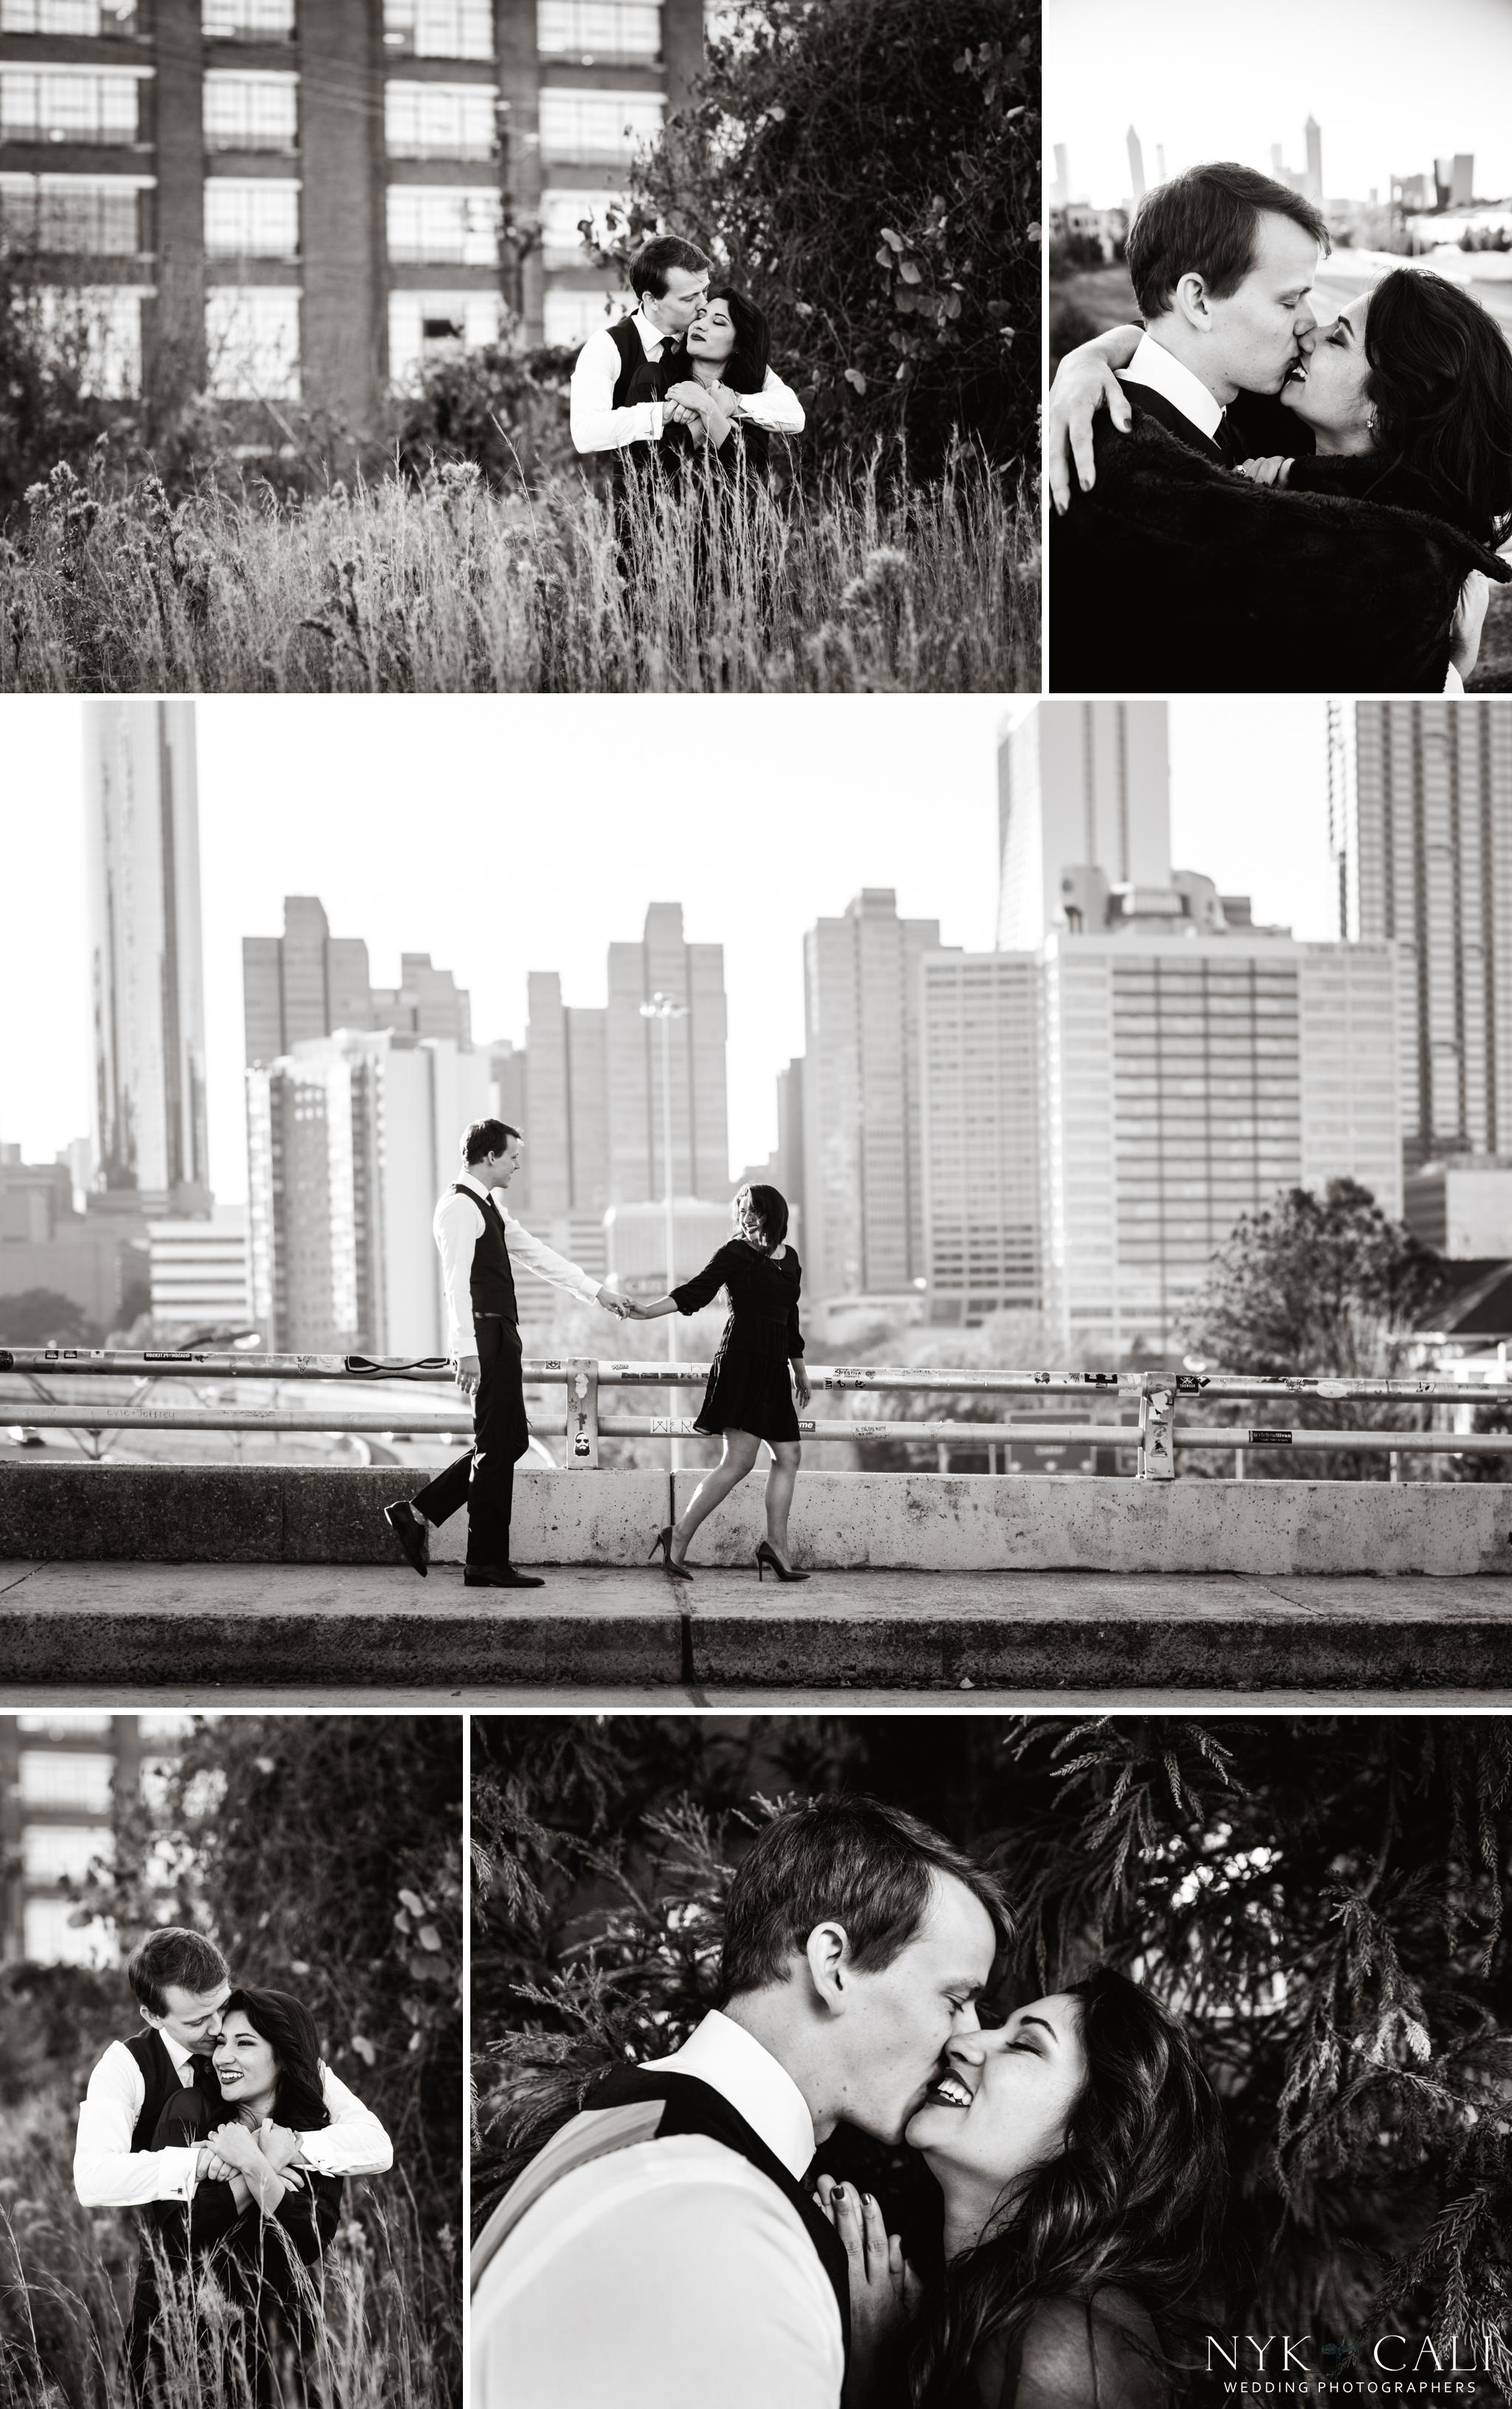 Steve + Stephanie | Atlanta Engagement Photography » Nyk +